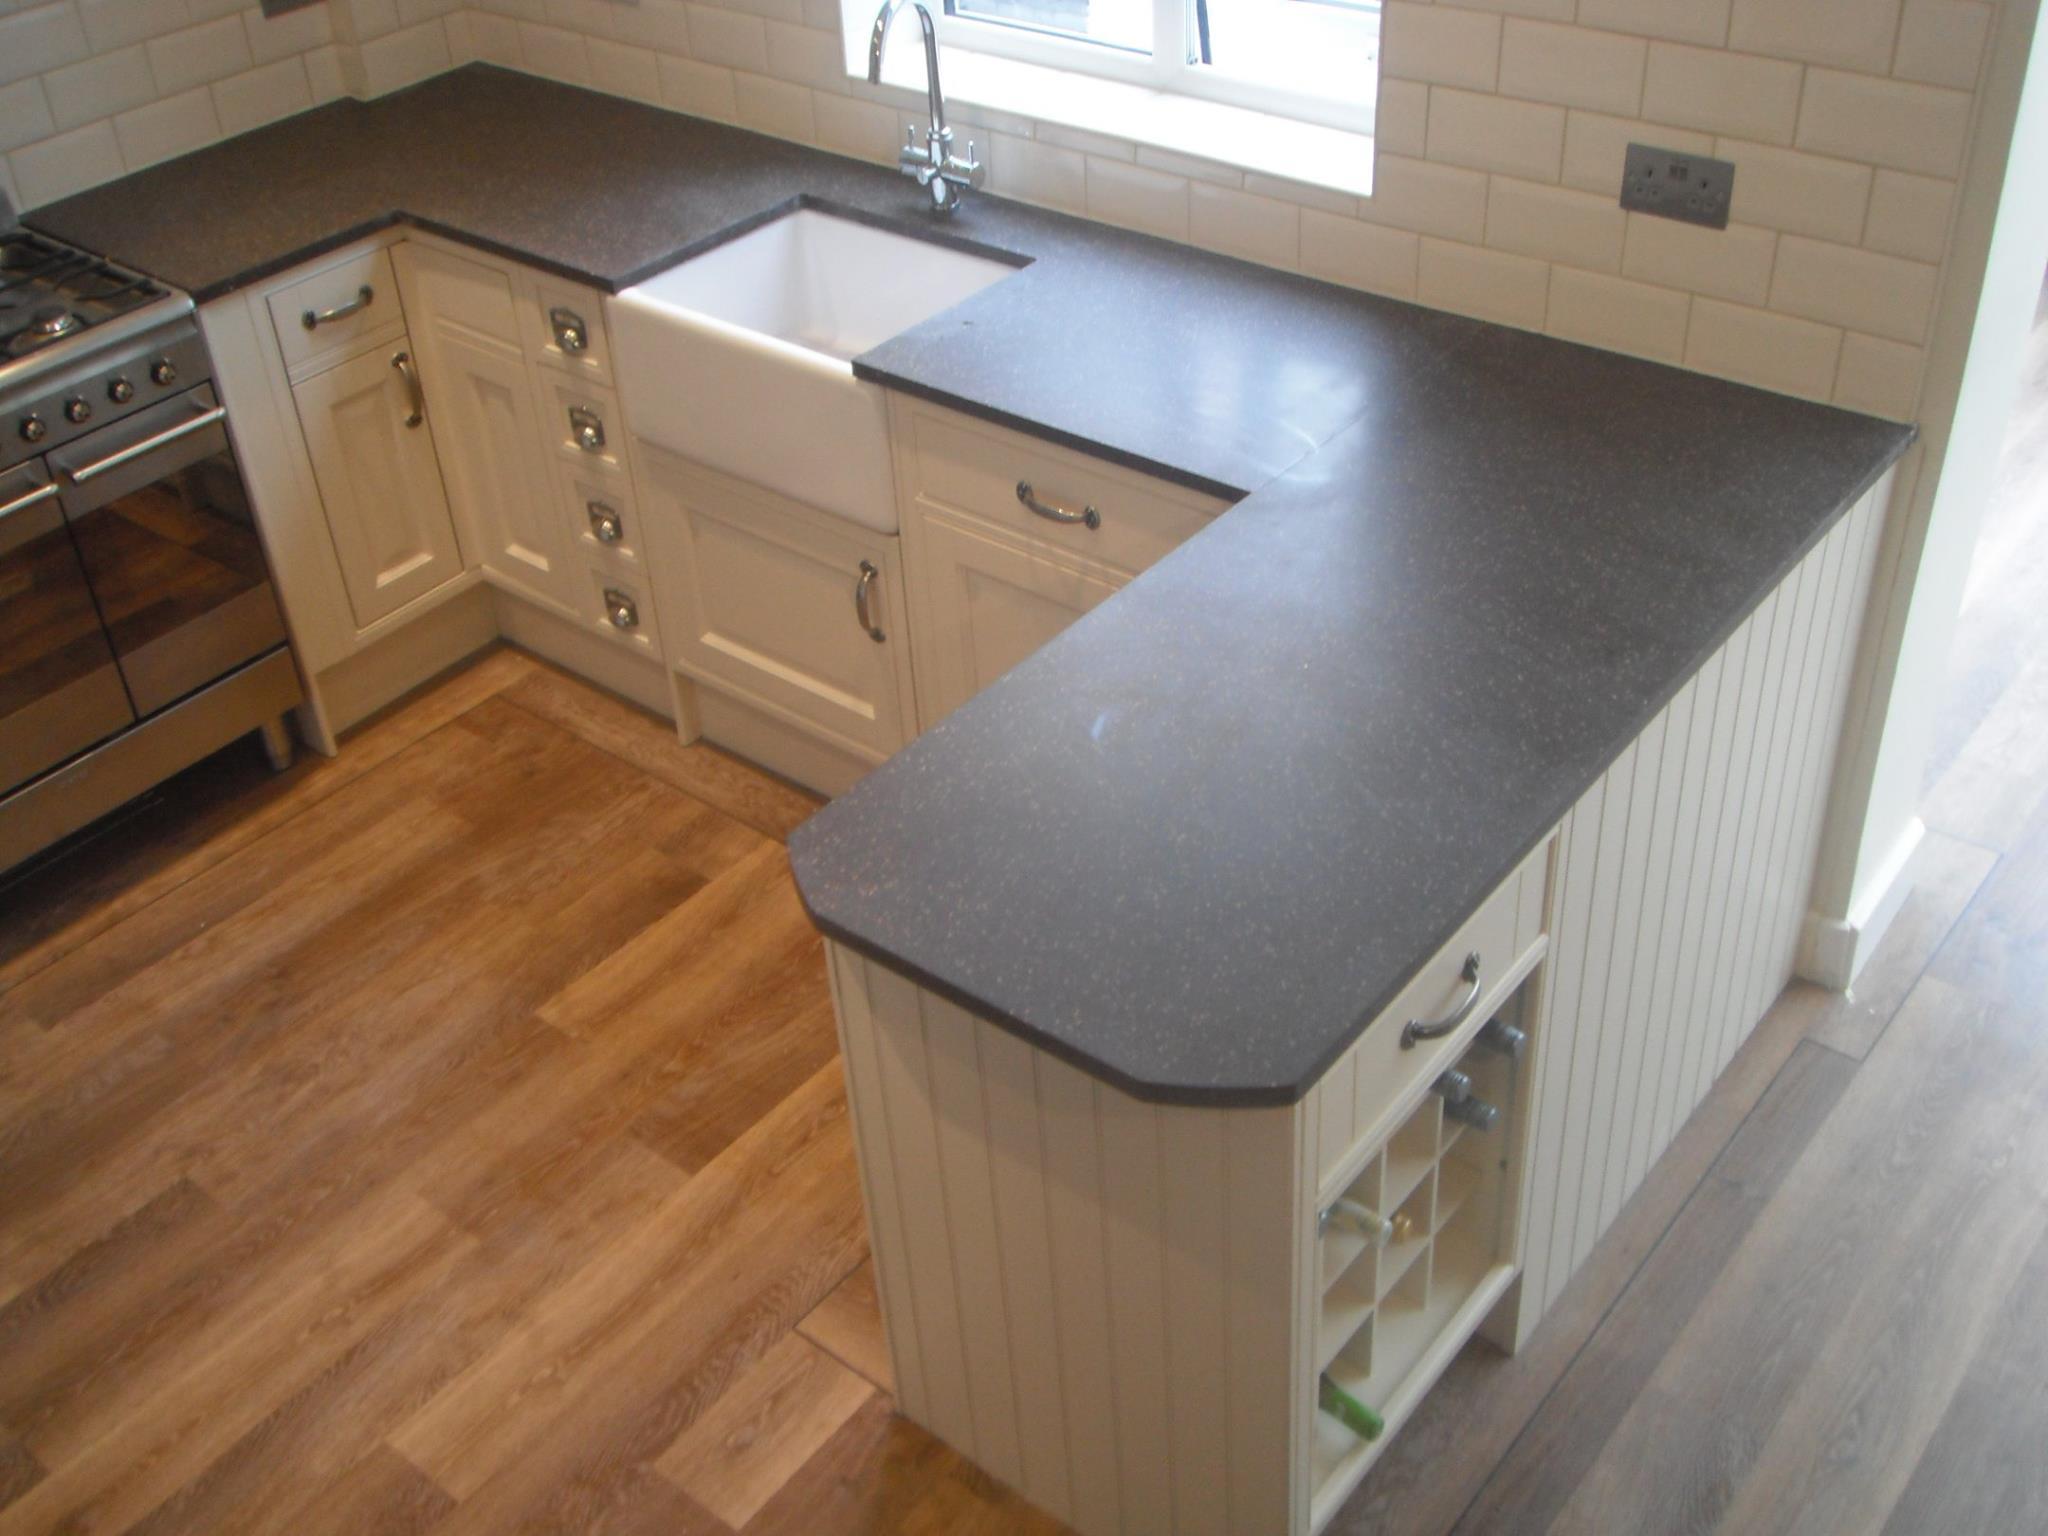 Kitchen refit | M Drury Tiling – Bathrooms – Kitchens